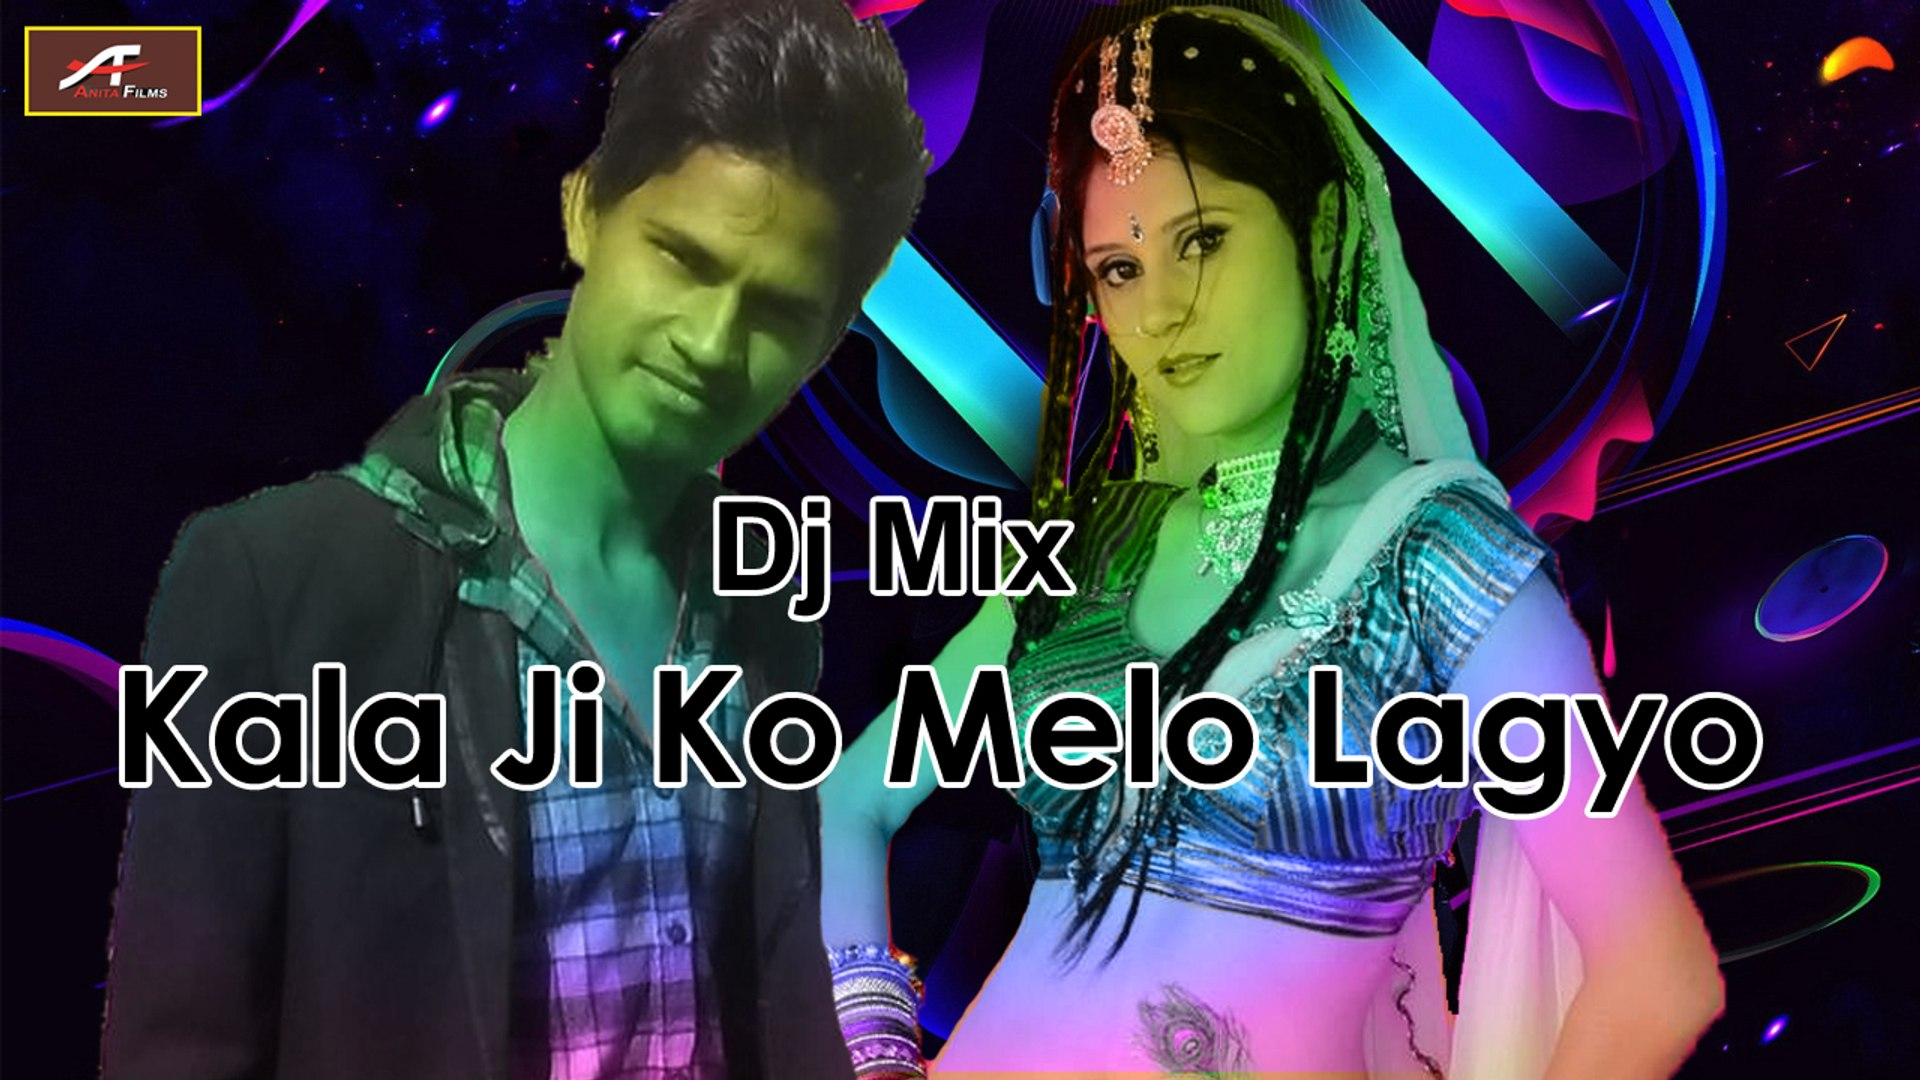 Brazil Mix Dj Song   Kala ji Ko Melo Lagyo-(Full Song) Audio   for  especially folk traditional dance   Latest Marwadi Songs   dailymotion    Rajasthani Dj Songs 2016 New